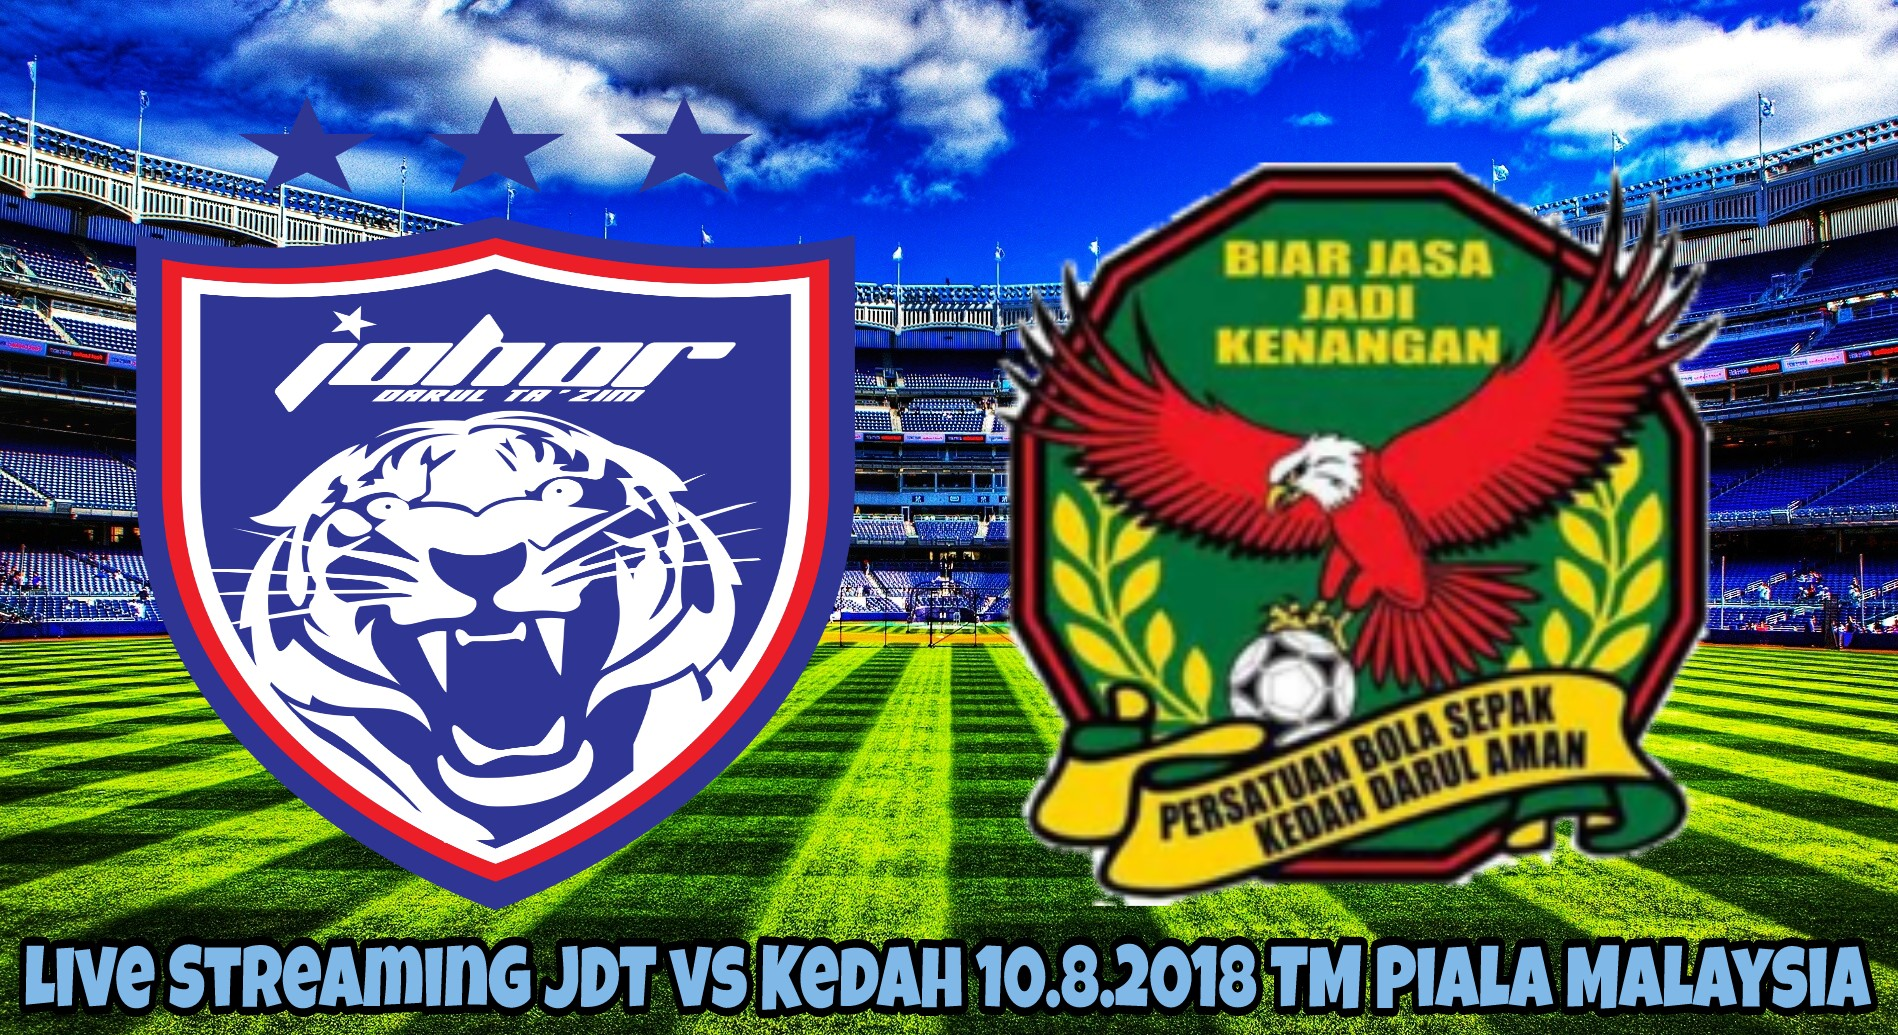 Live Streaming JDT vs Kedah 10.8.2018 TM Piala Malaysia